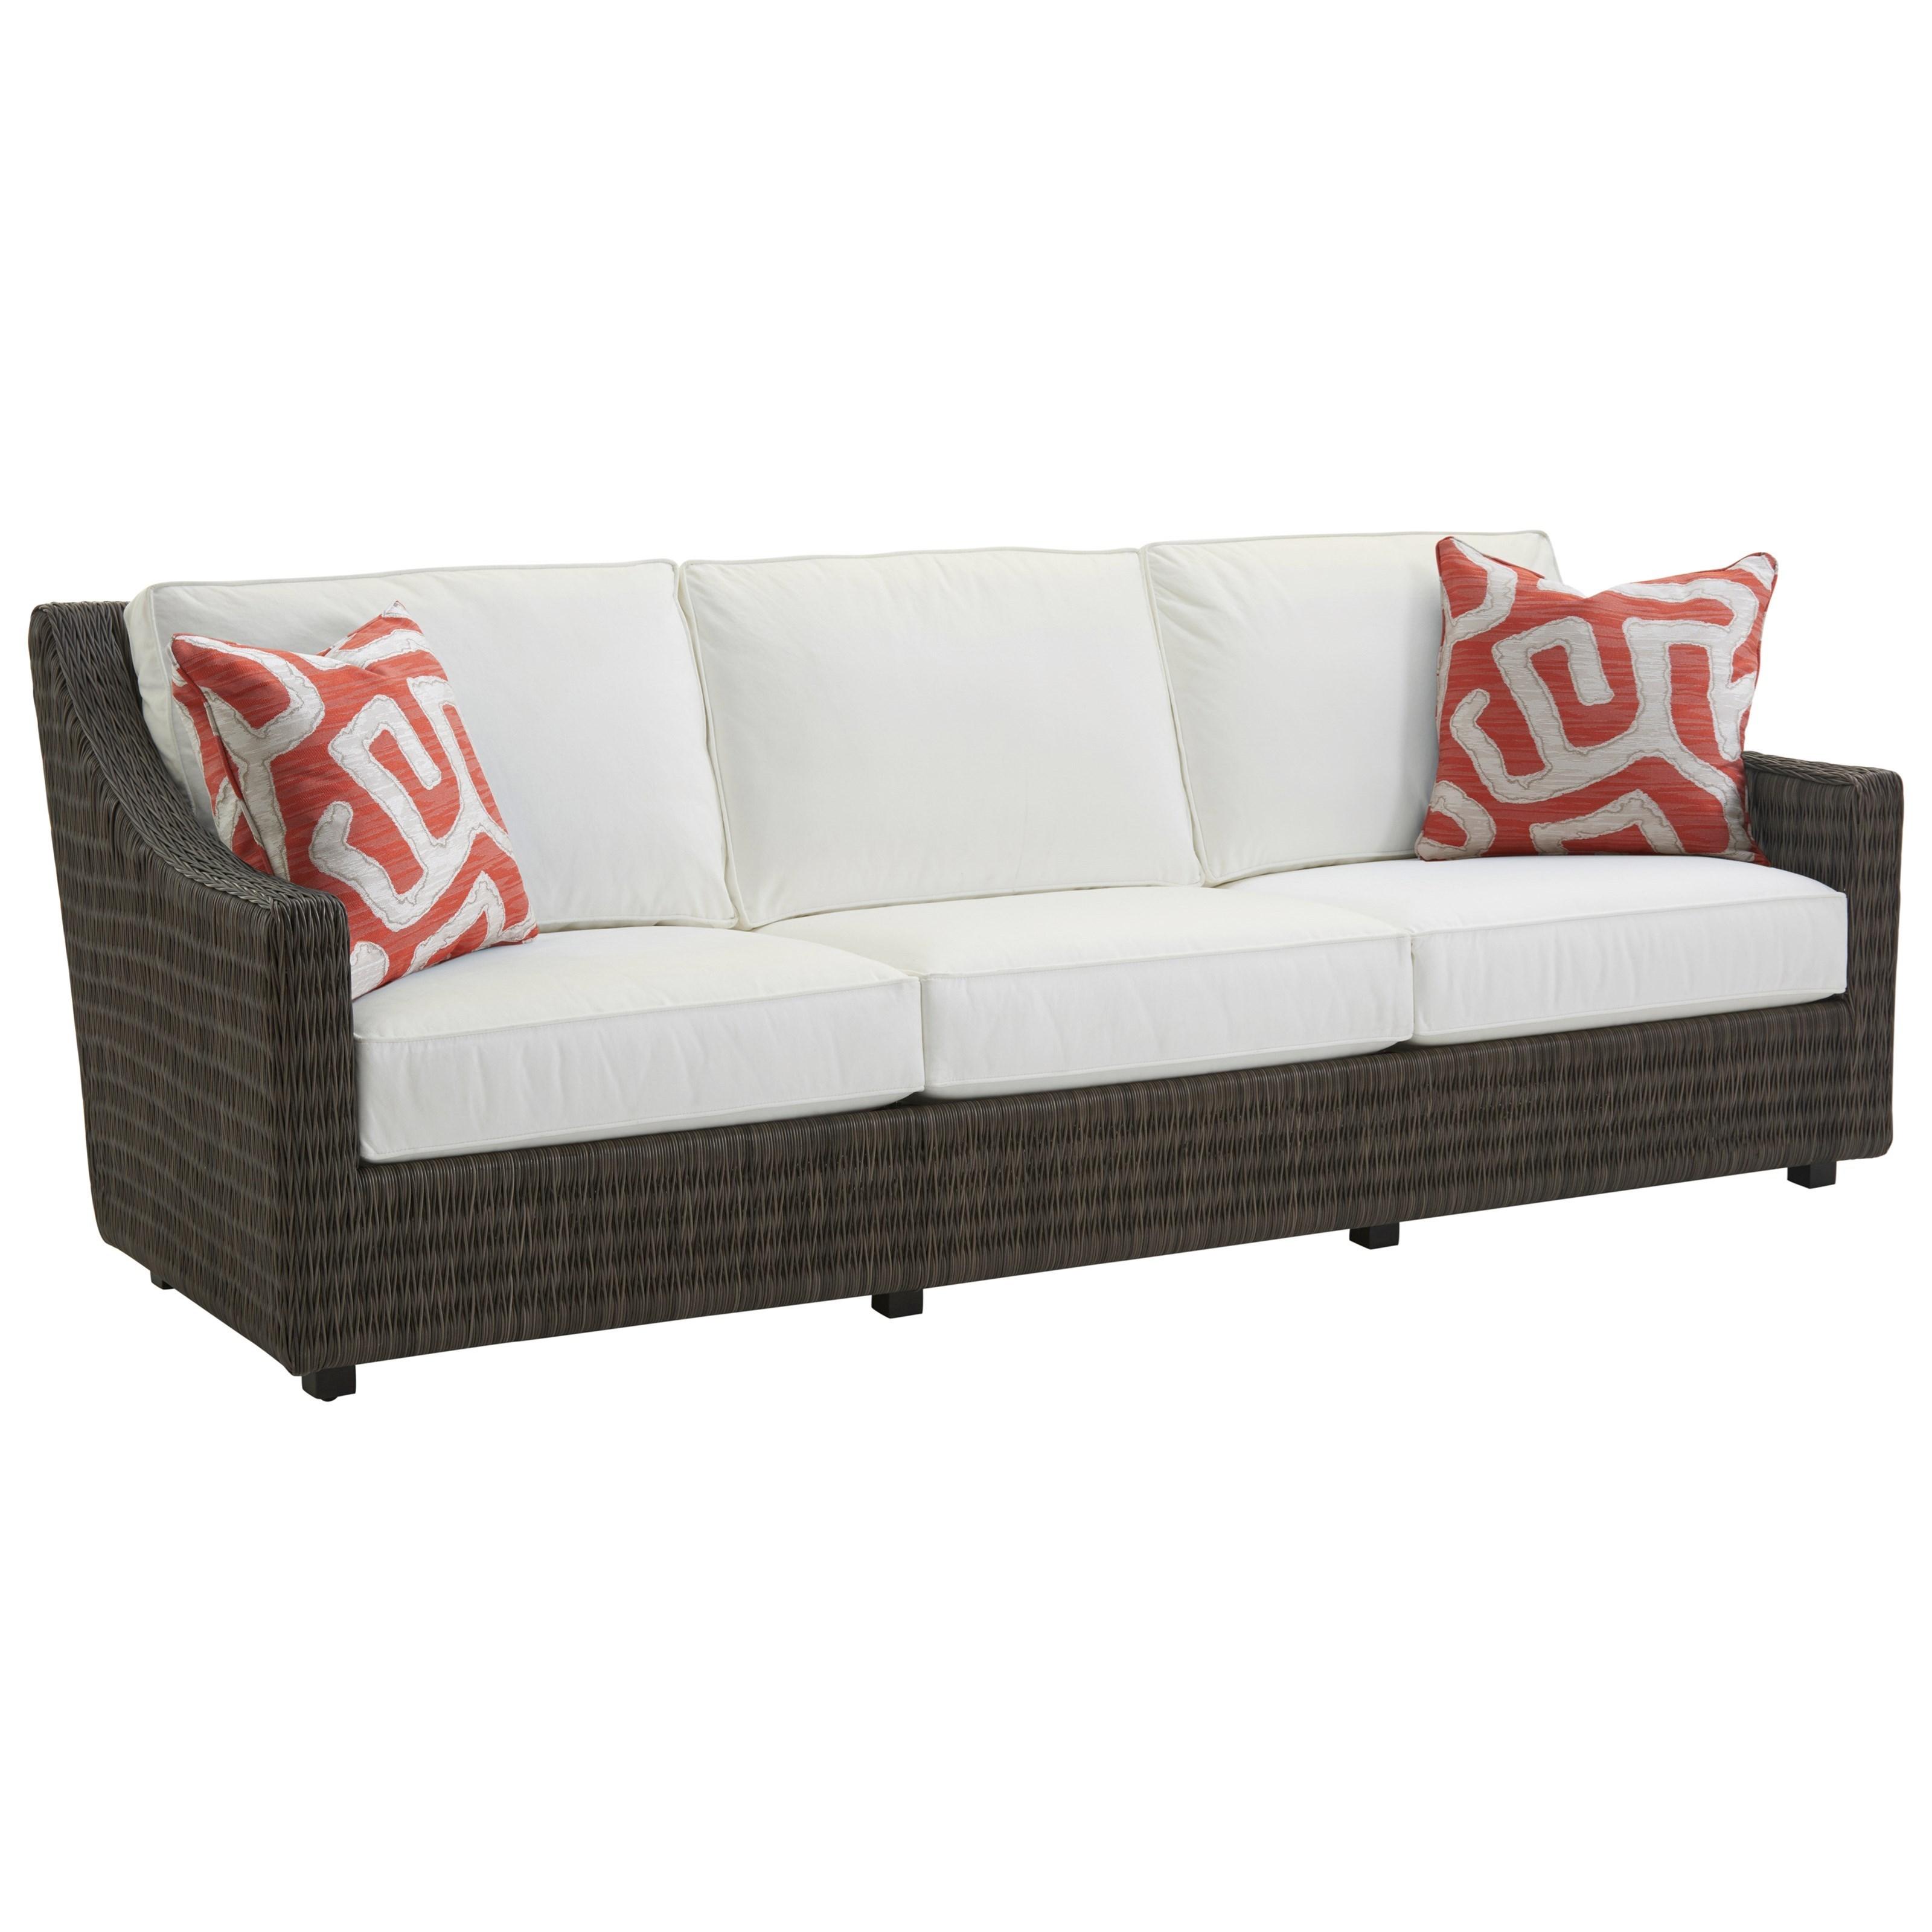 Outdoor Sofa with Weatherproof Cushions